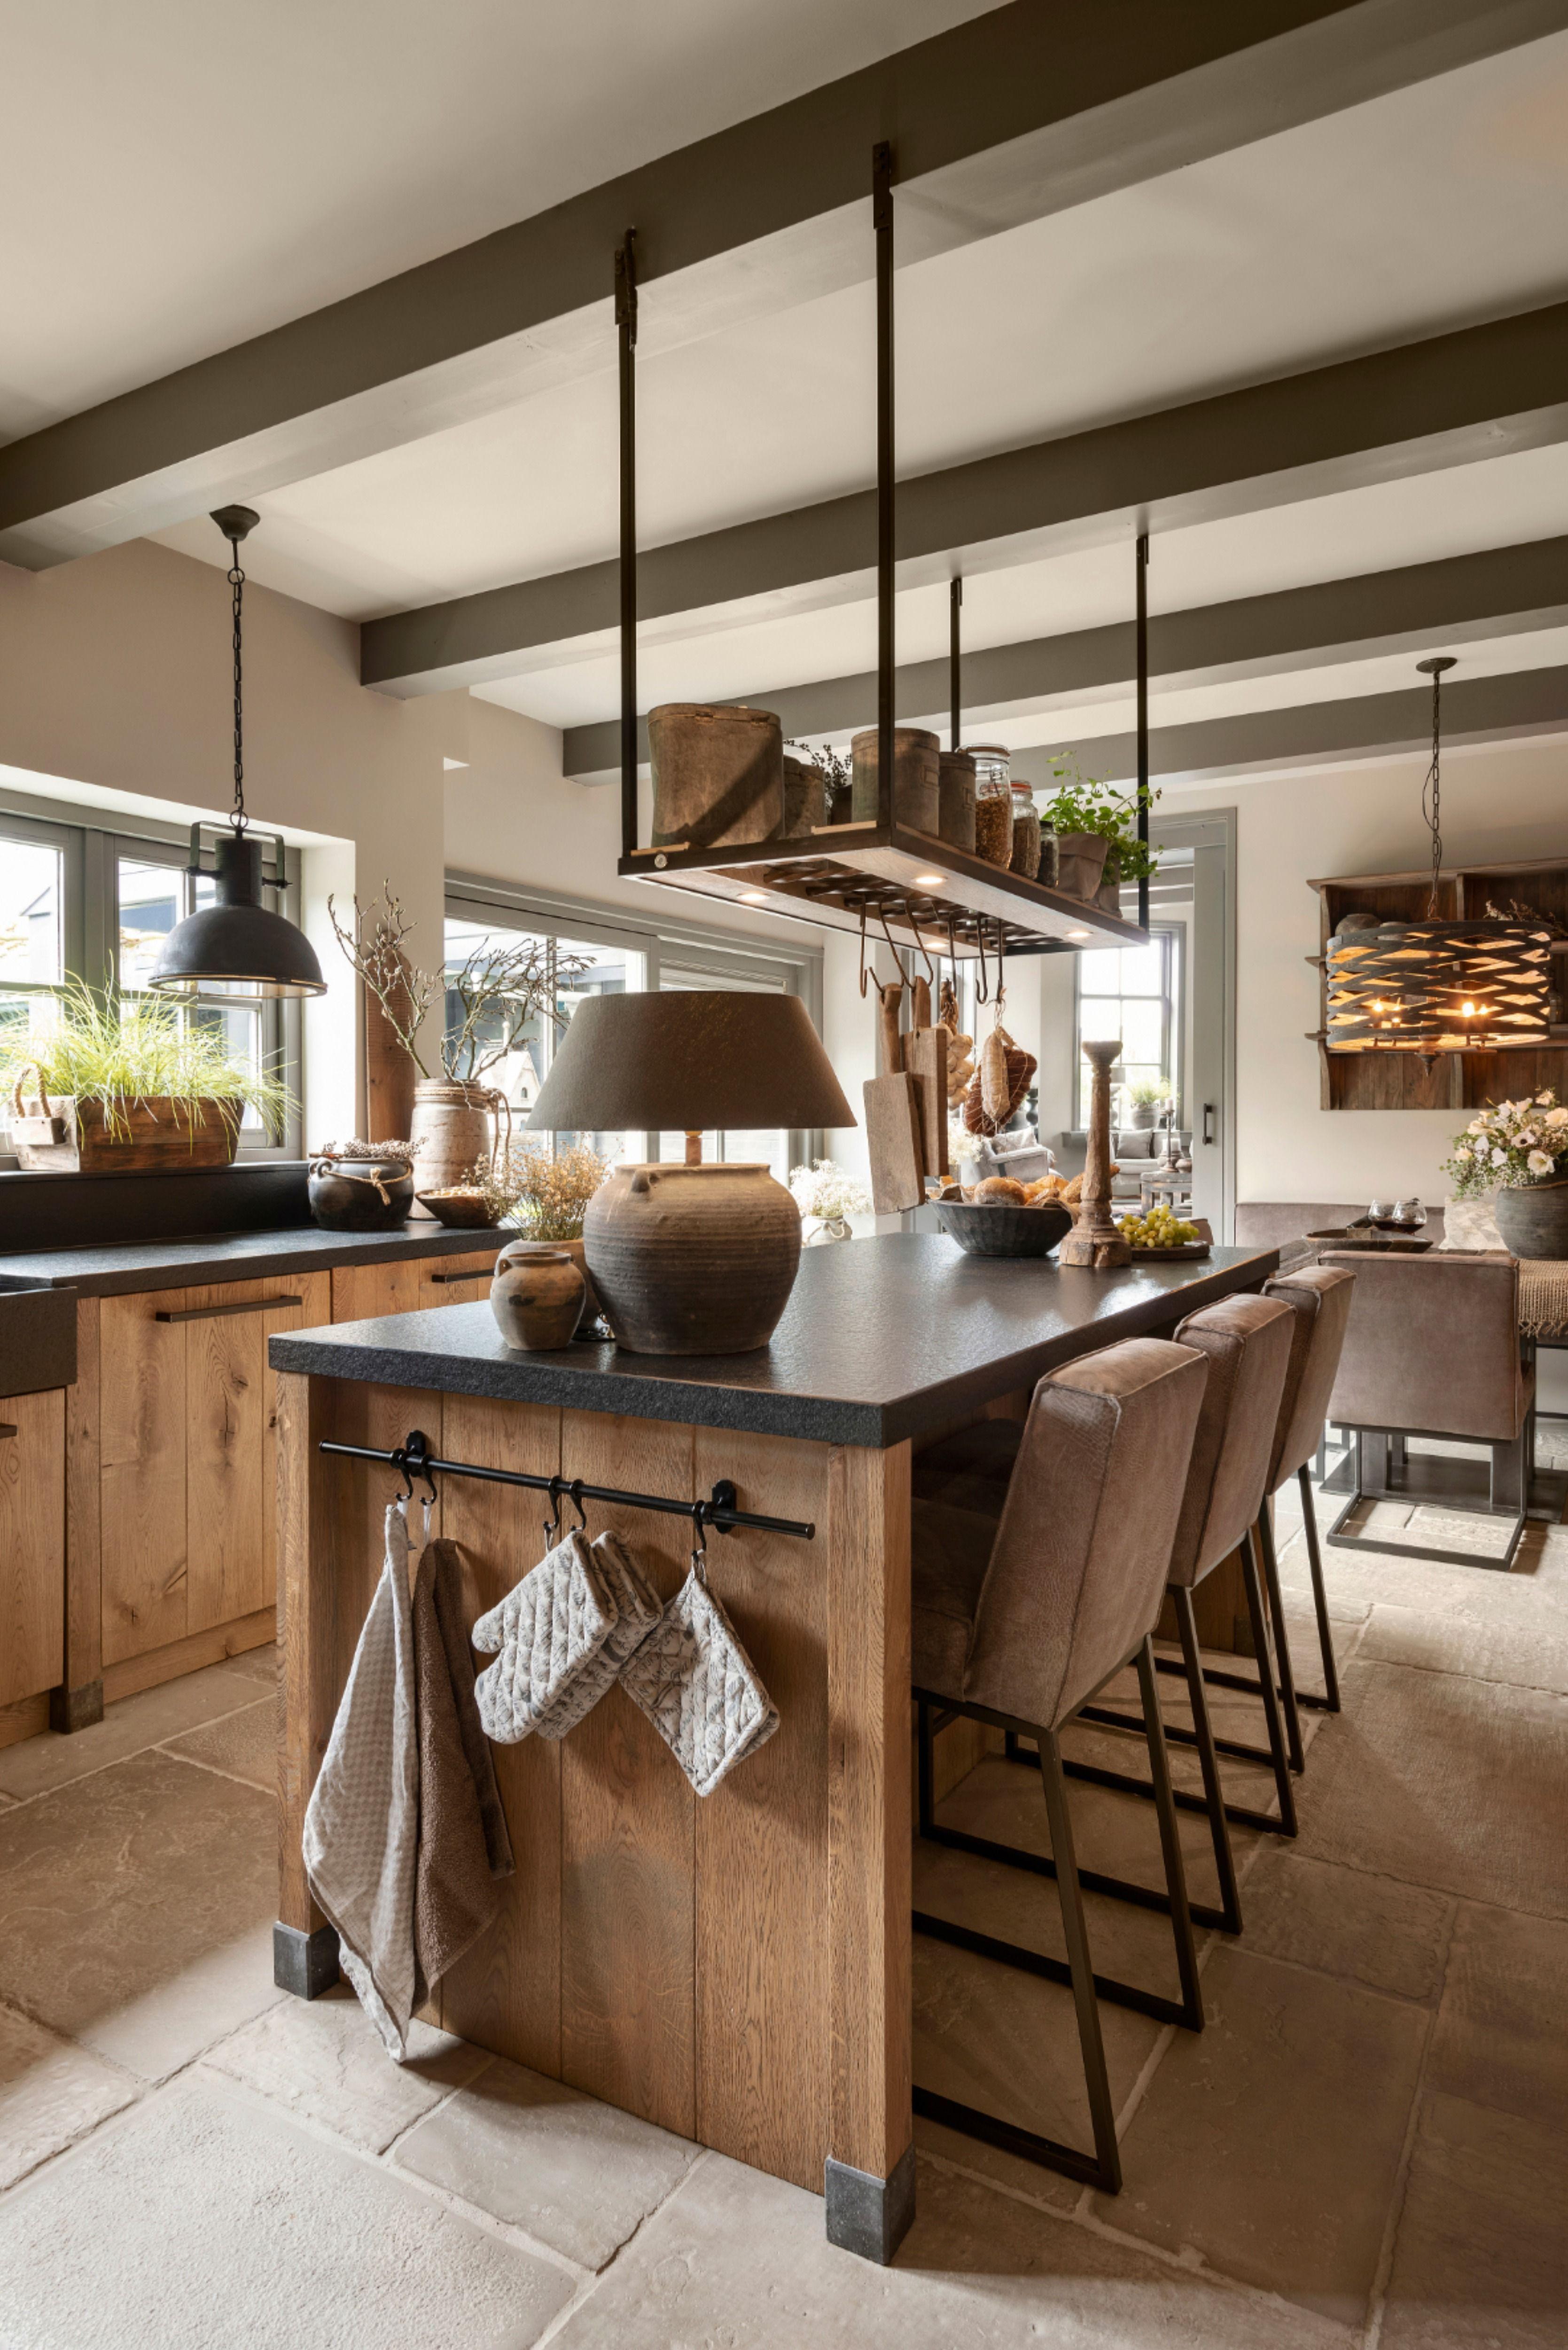 babysocken stricken kostenlose anleitung caros fummeley cuisine moderne amenagement maison interieur de cuisine